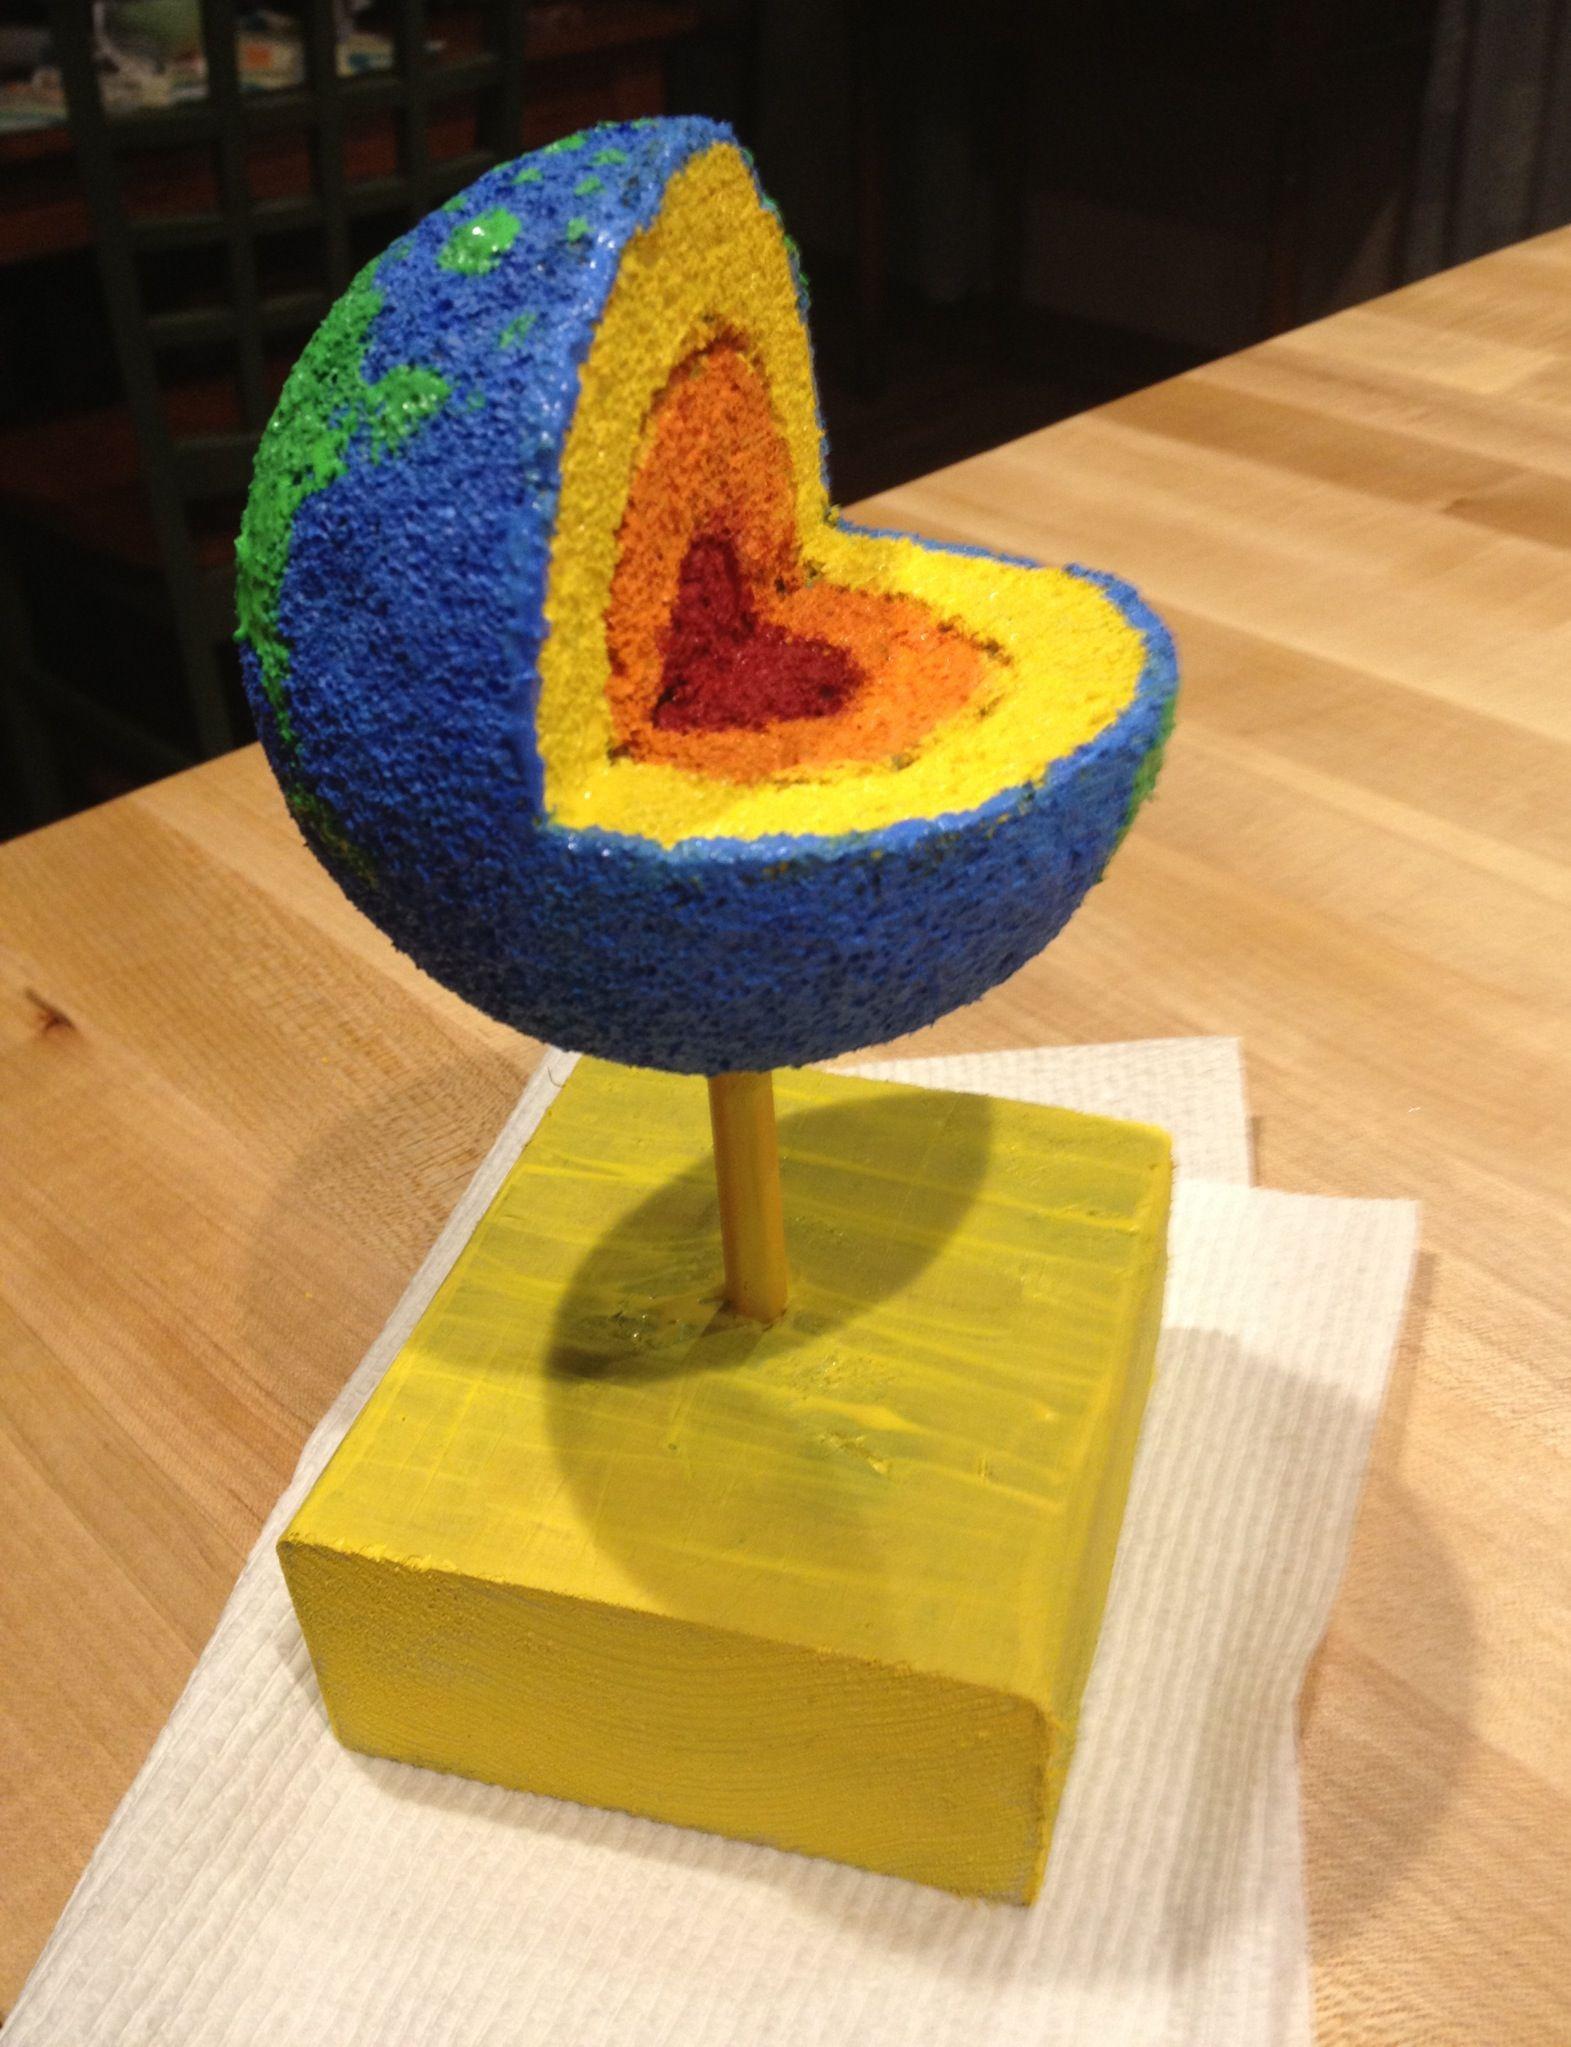 Earth Layer Project Using Styrofoam Ball Acrylic Paint